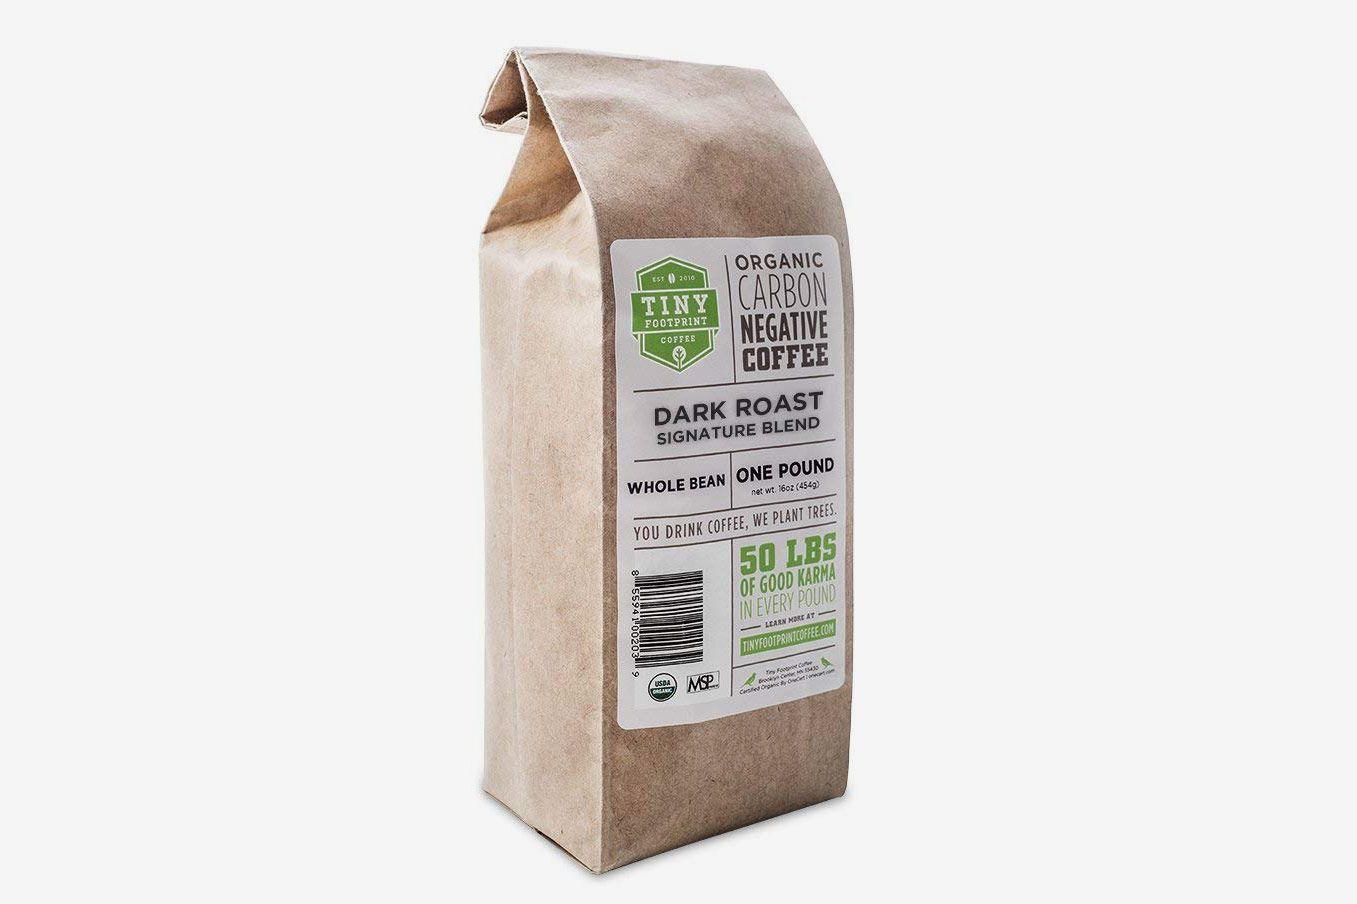 Tiny Footprint Coffee Organic Signature Blend Dark Roast, Whole Bean Coffee (Pack of 2)